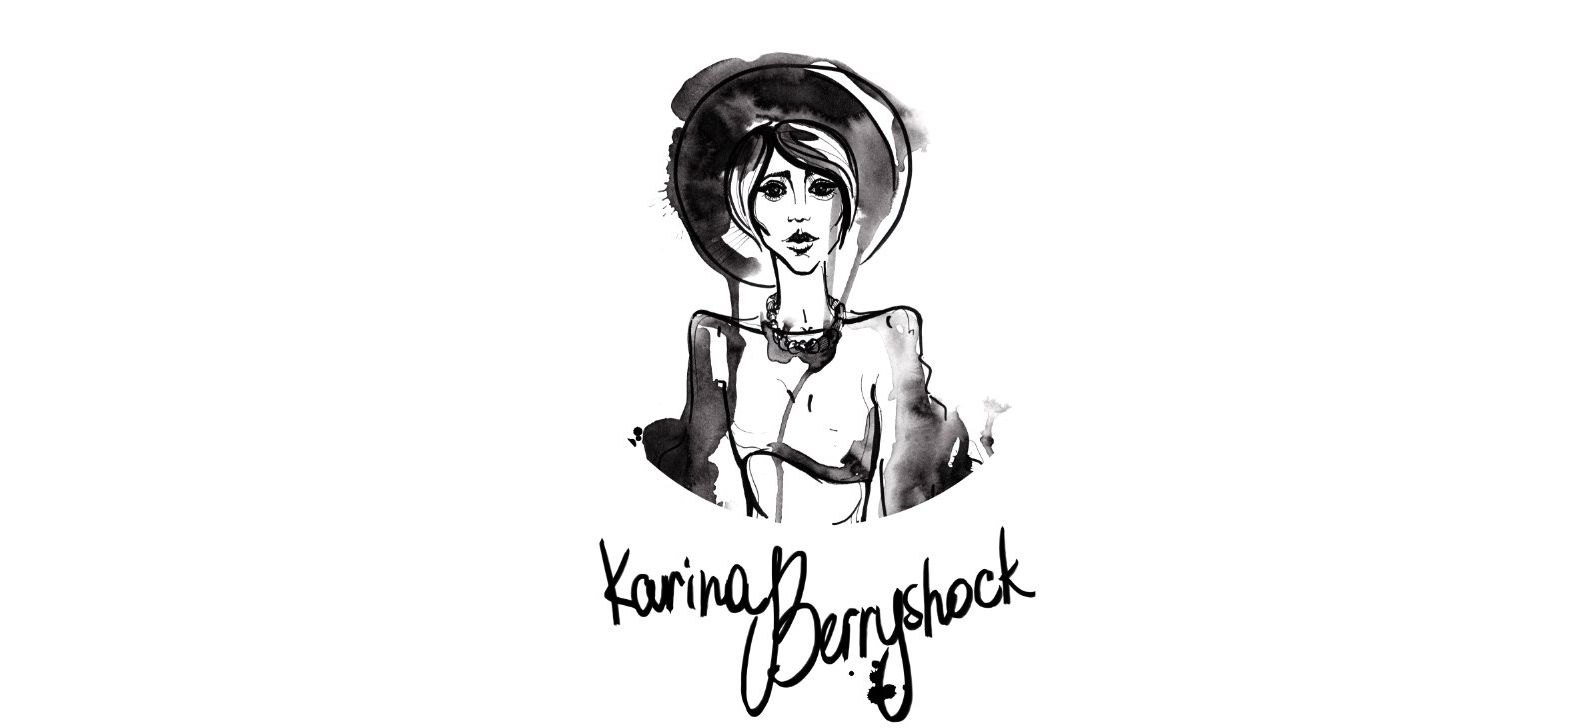 Karina Berryshock